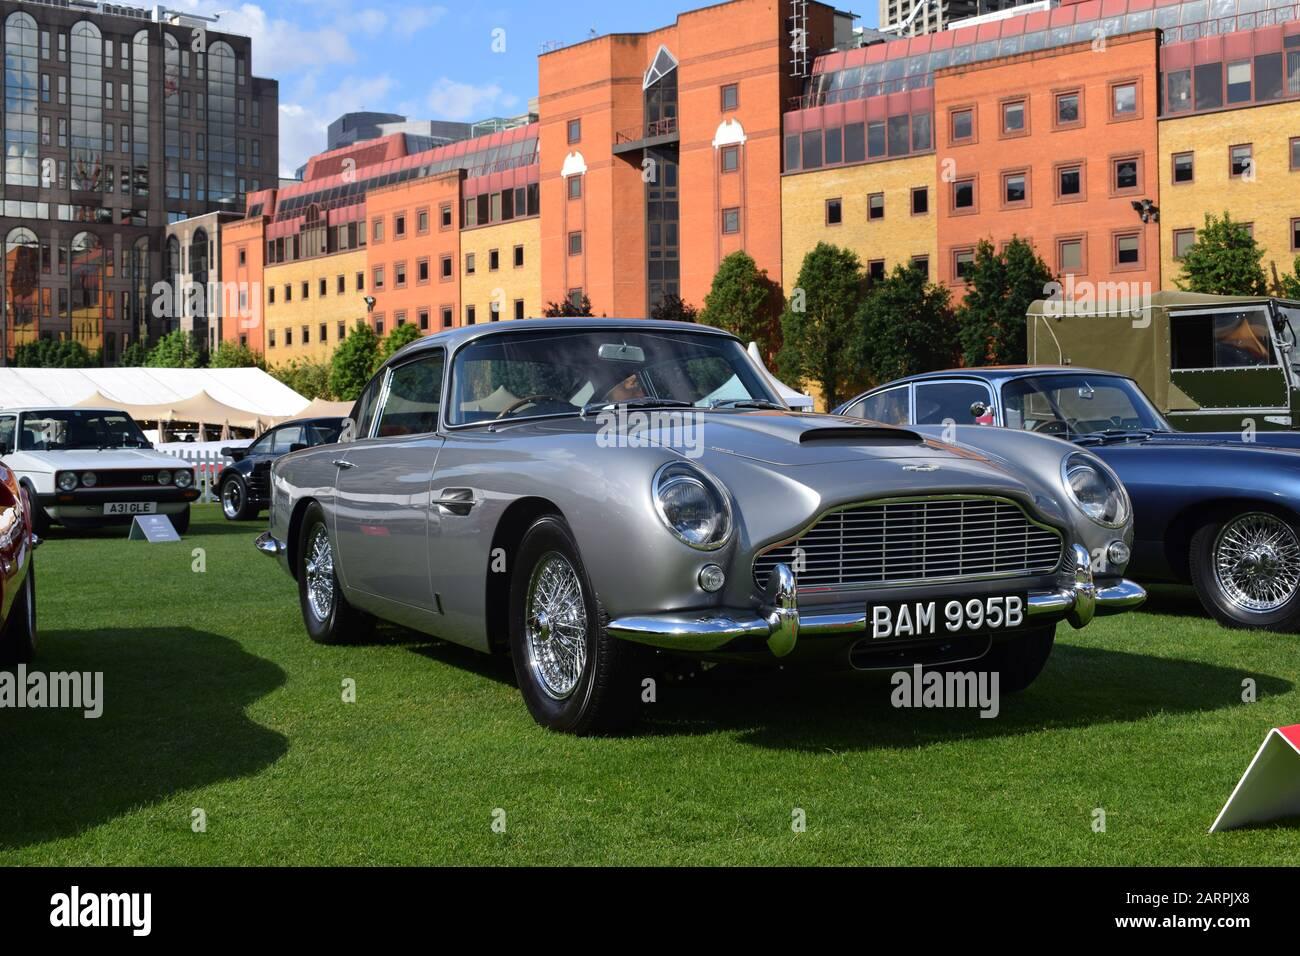 Aston Martin Db5 In Silver Birch Stock Photo Alamy